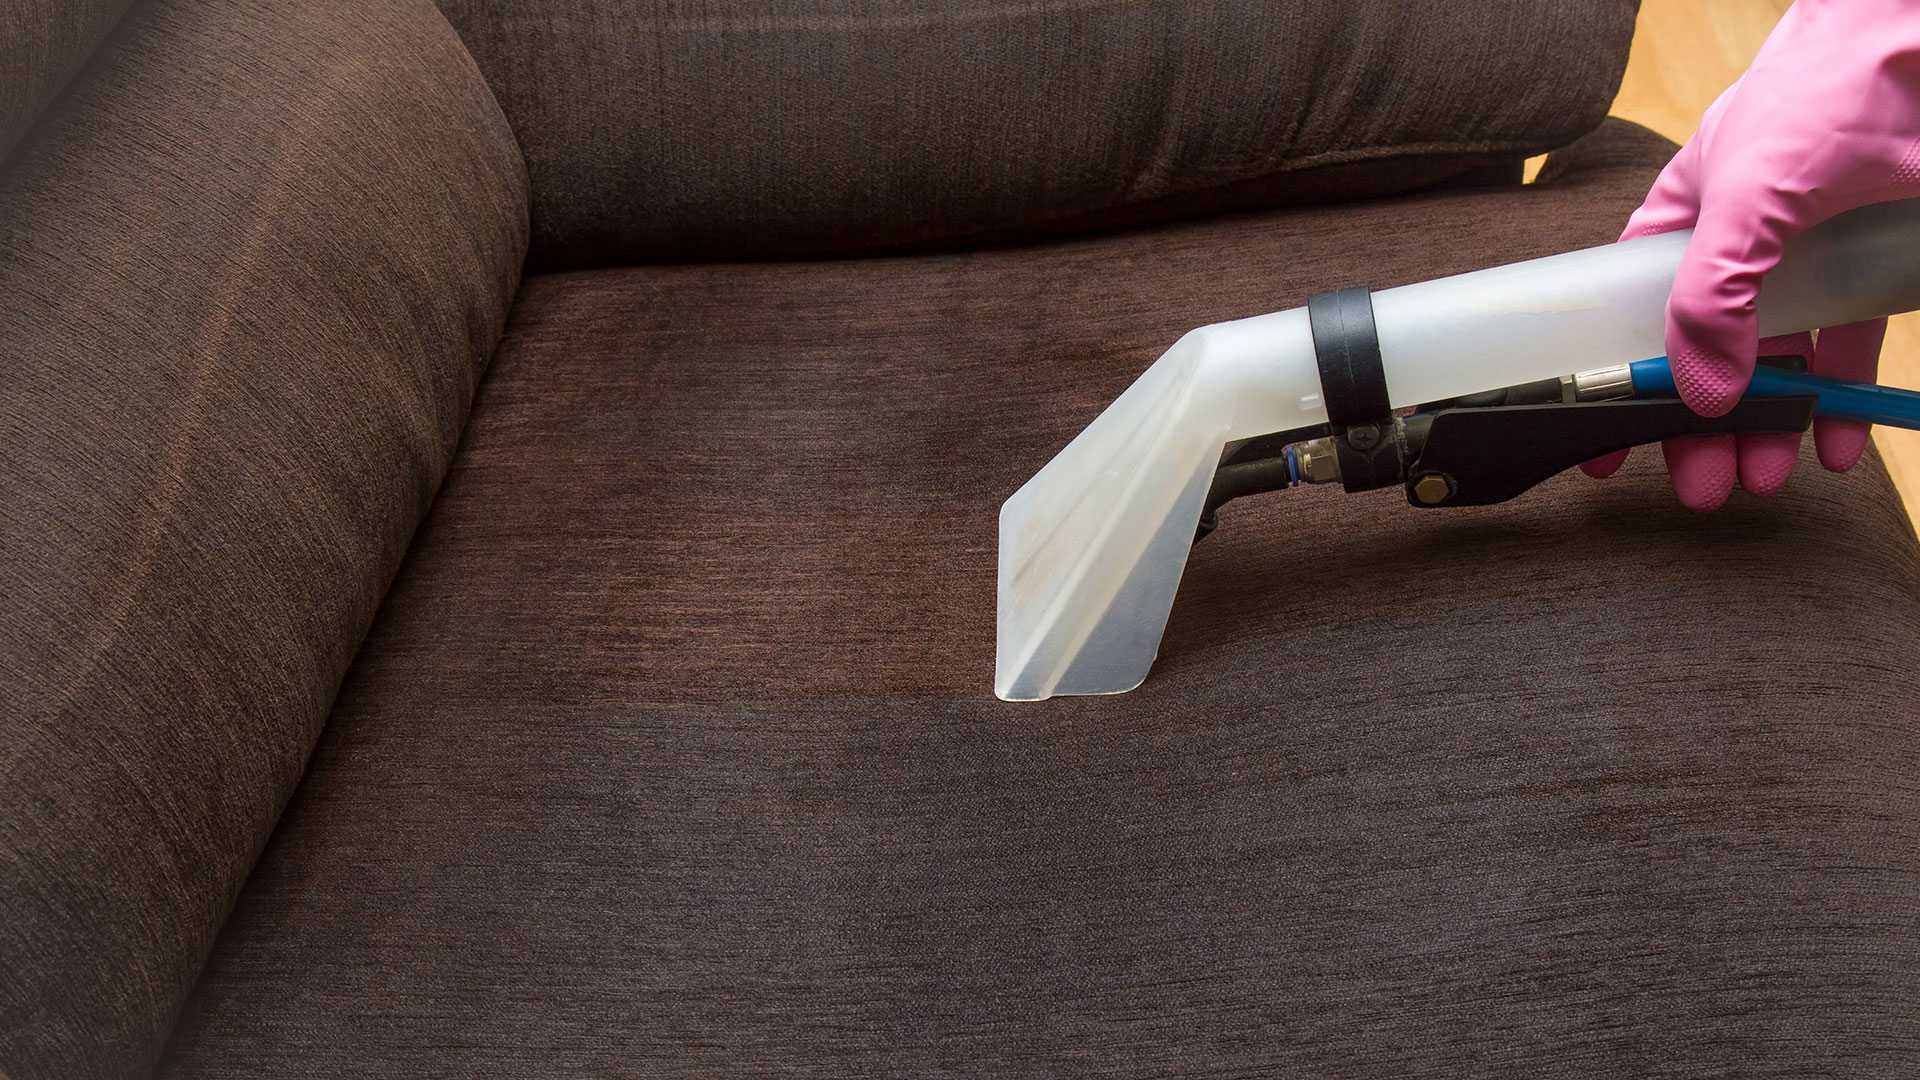 Sofa Cleaning Fairfield